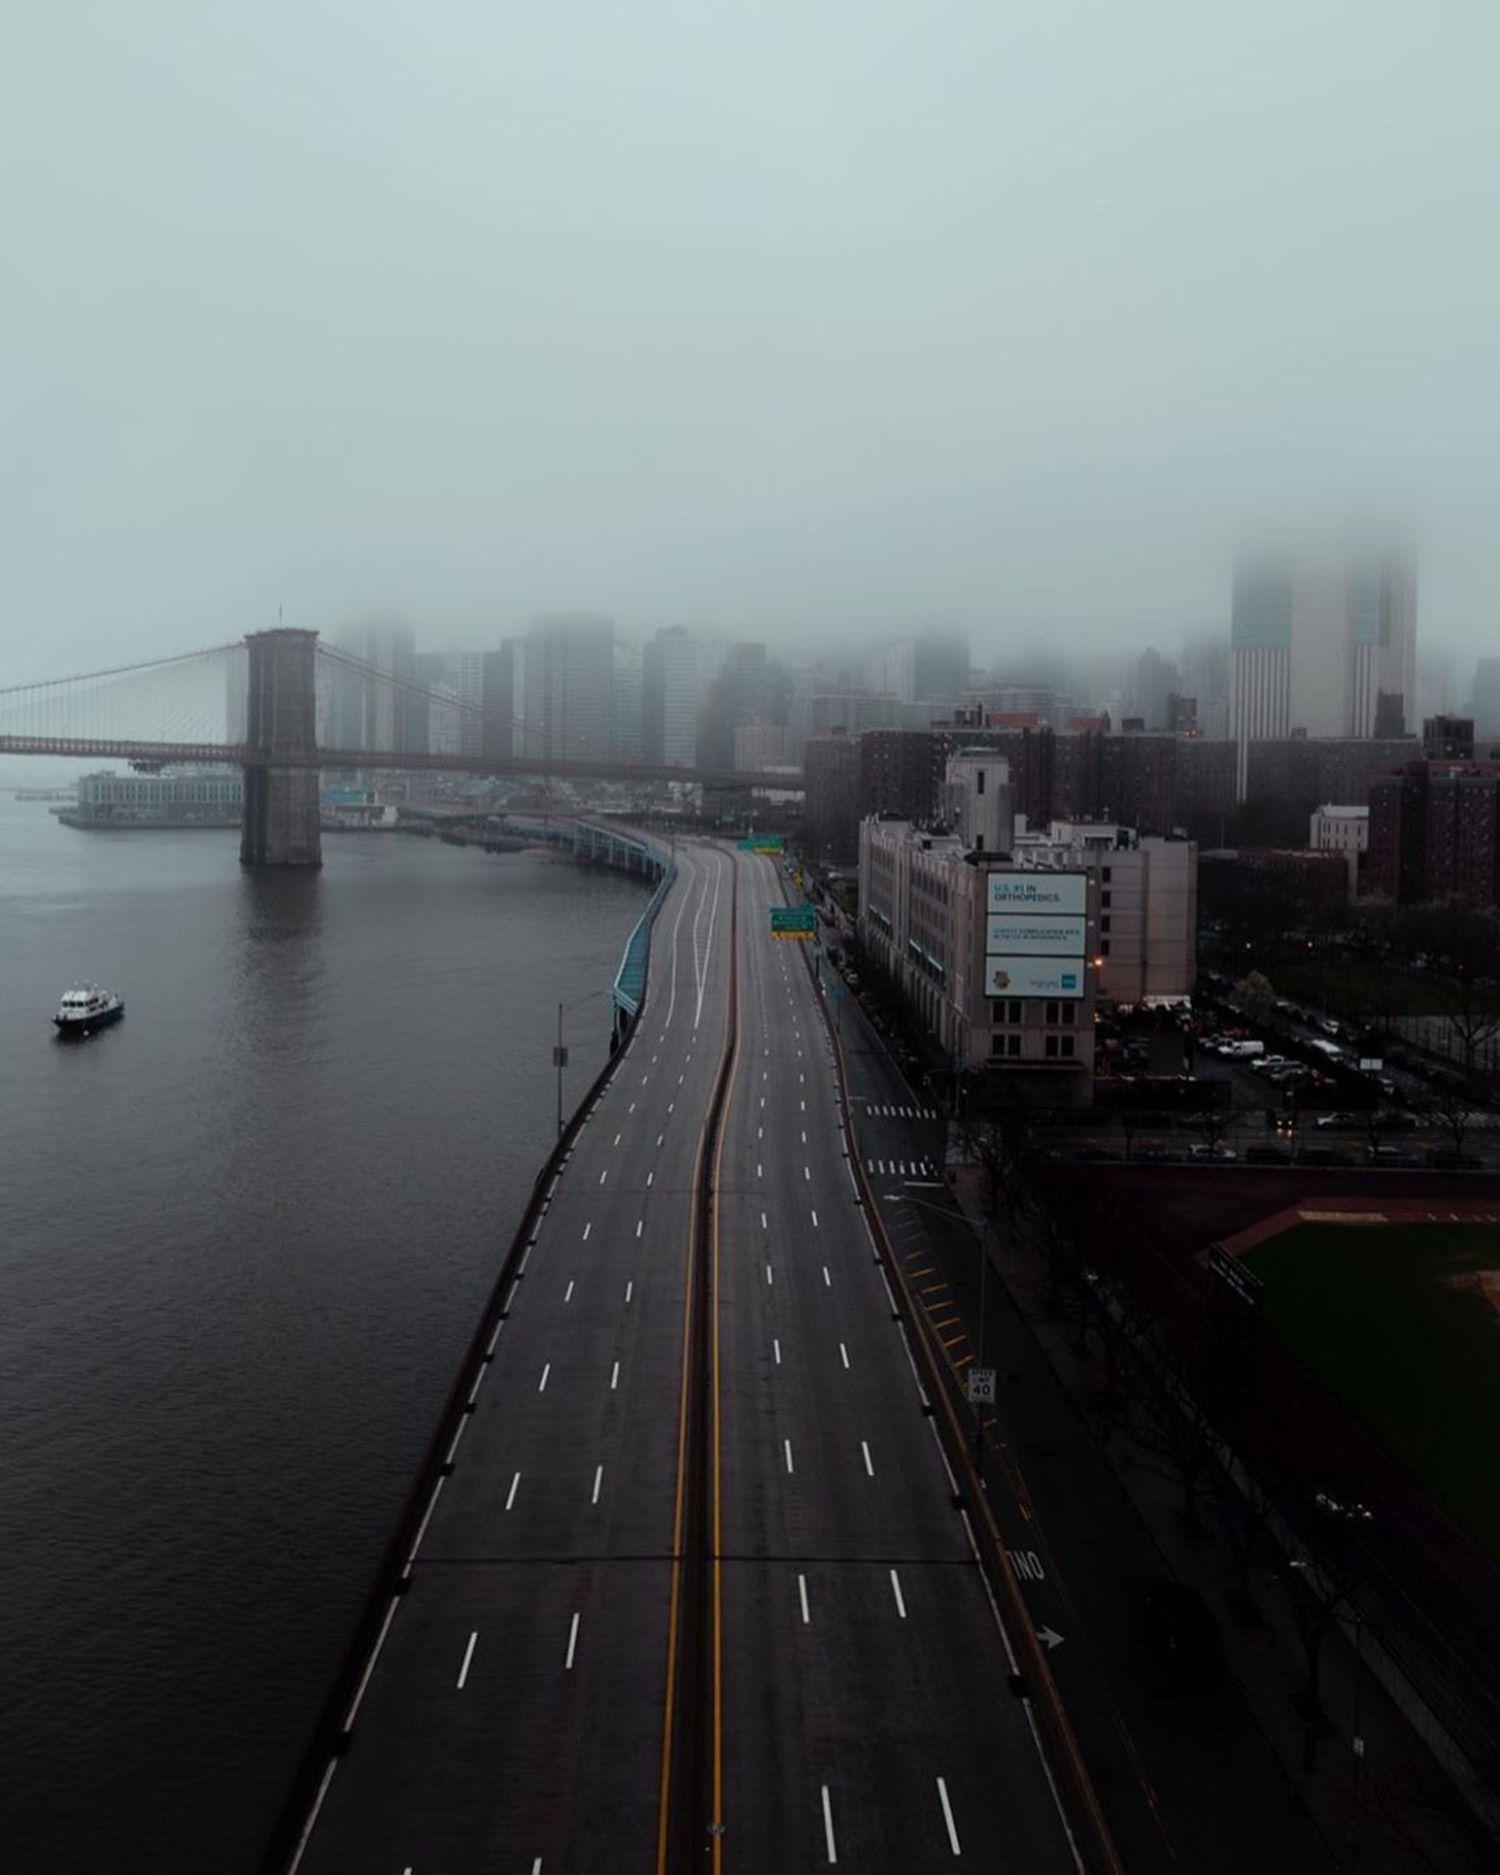 FDR East River Drive, Lower Manhattan